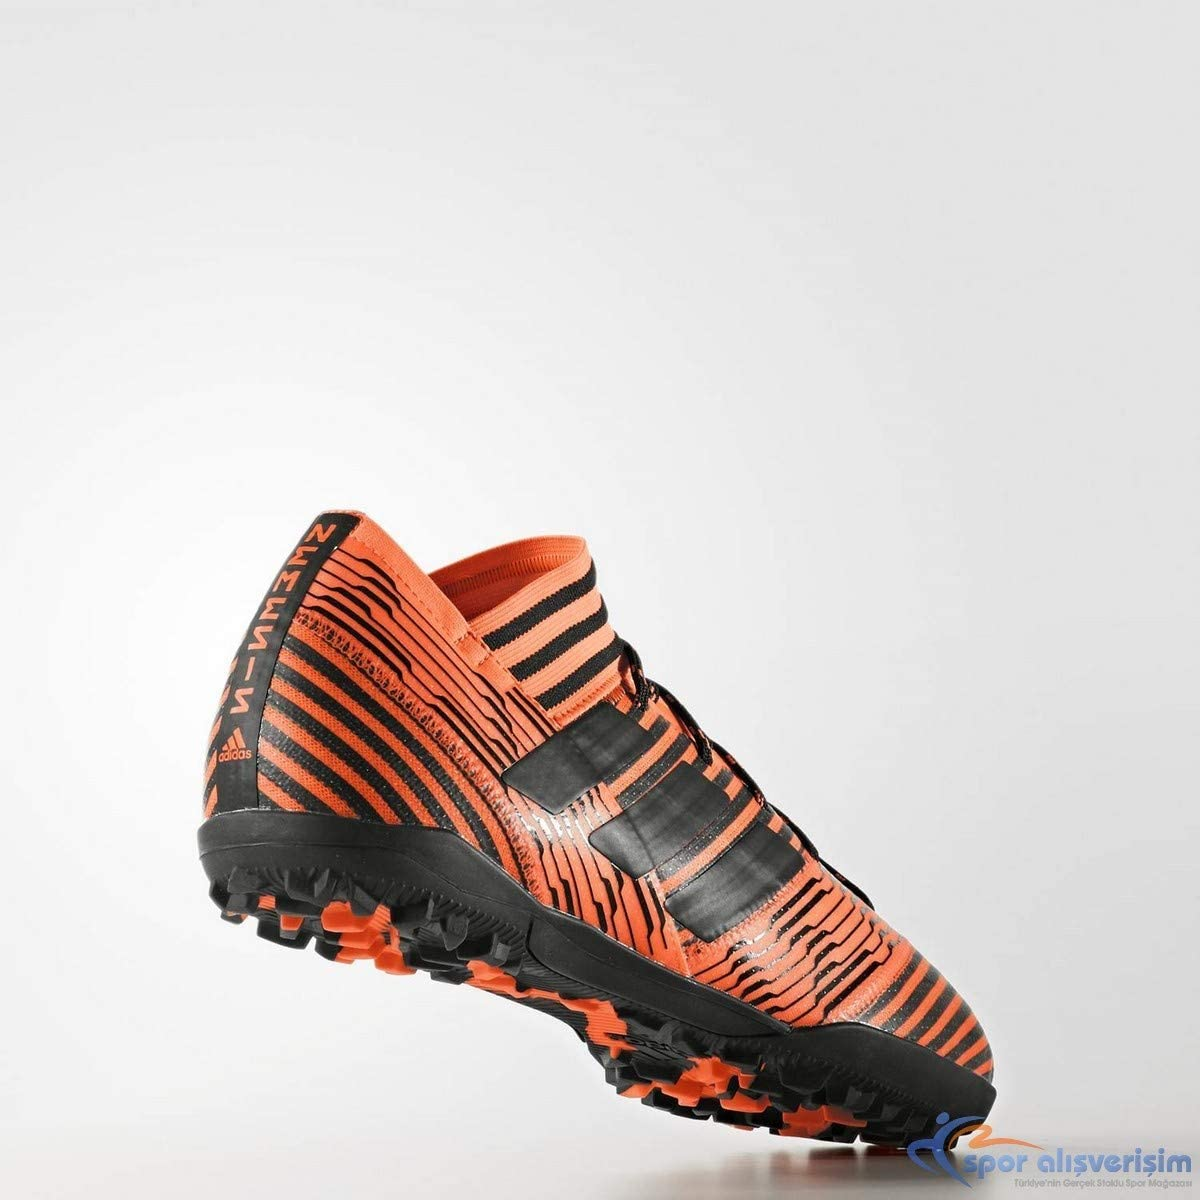 adidas Chaussures Nemeziz Tango 17.3 Turf: Amazon.es: Deportes y aire libre